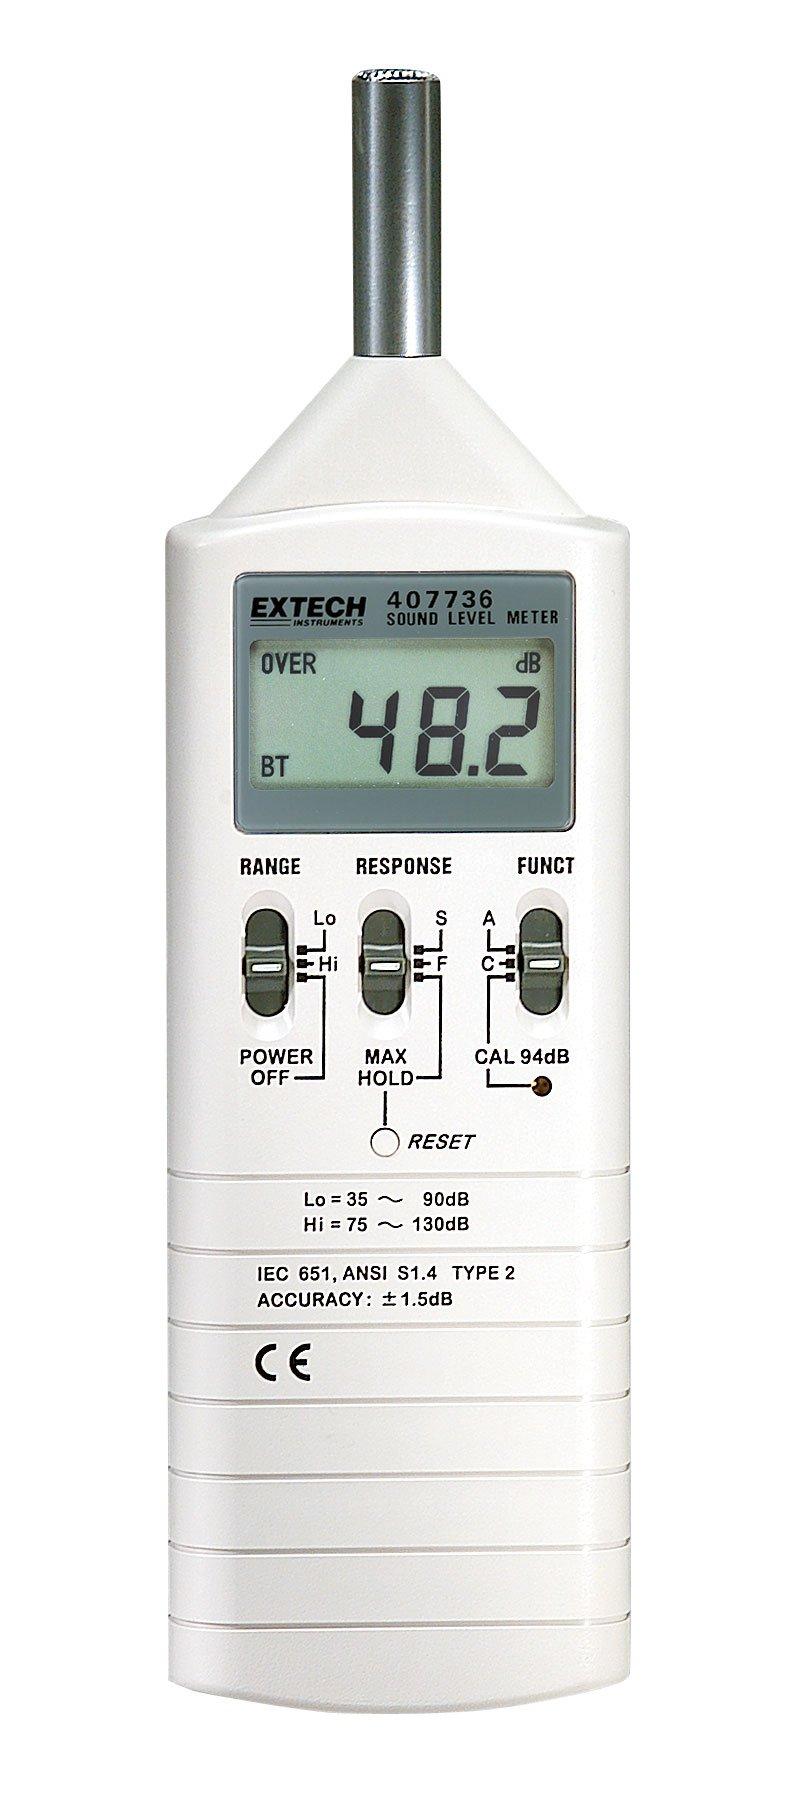 Extech 407736 Dual Range Type 2 Sound Lever Meter